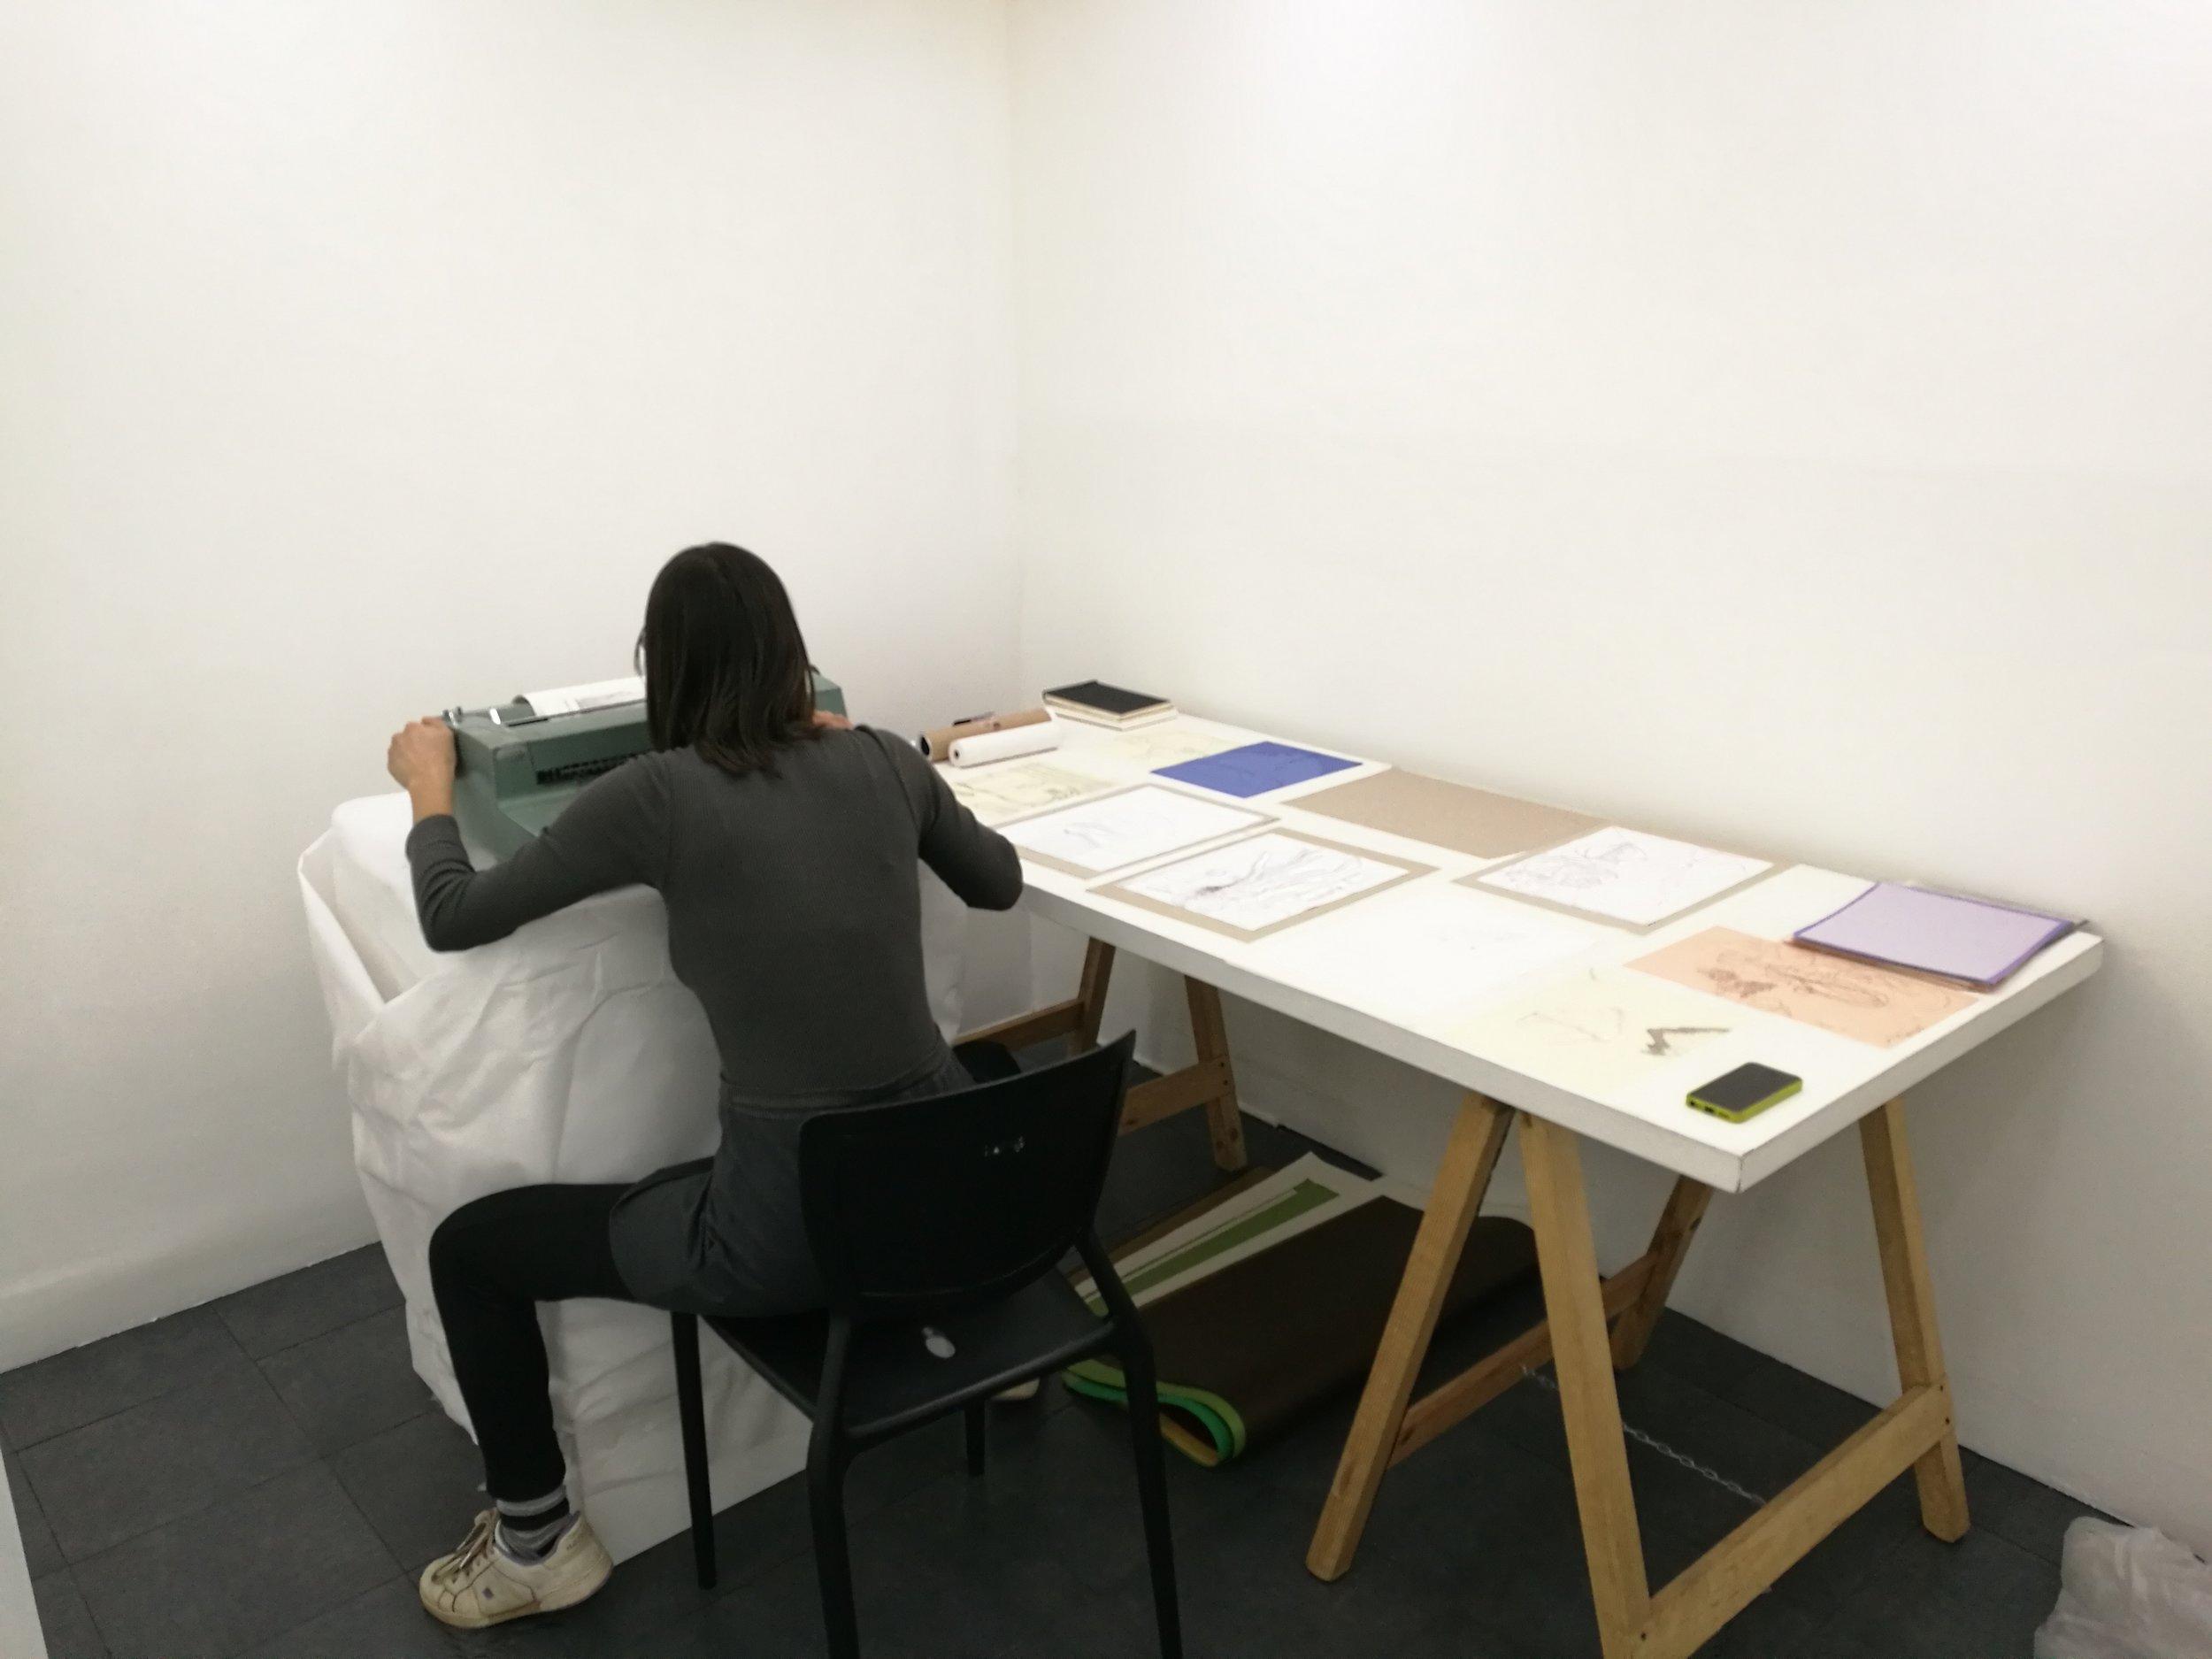 camila fernandez - project room 6.jpg